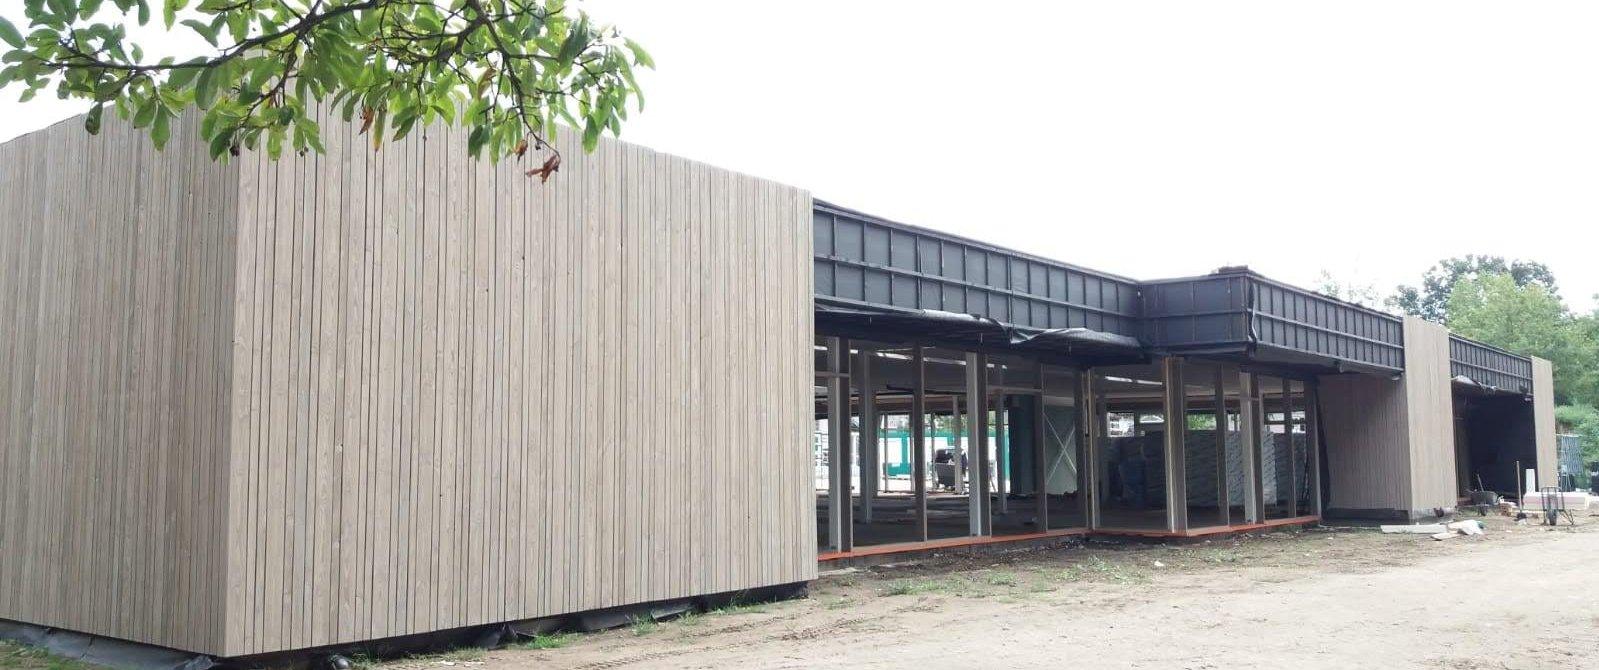 prefab-houtskeletbouw-witzand-bouwmaterialen